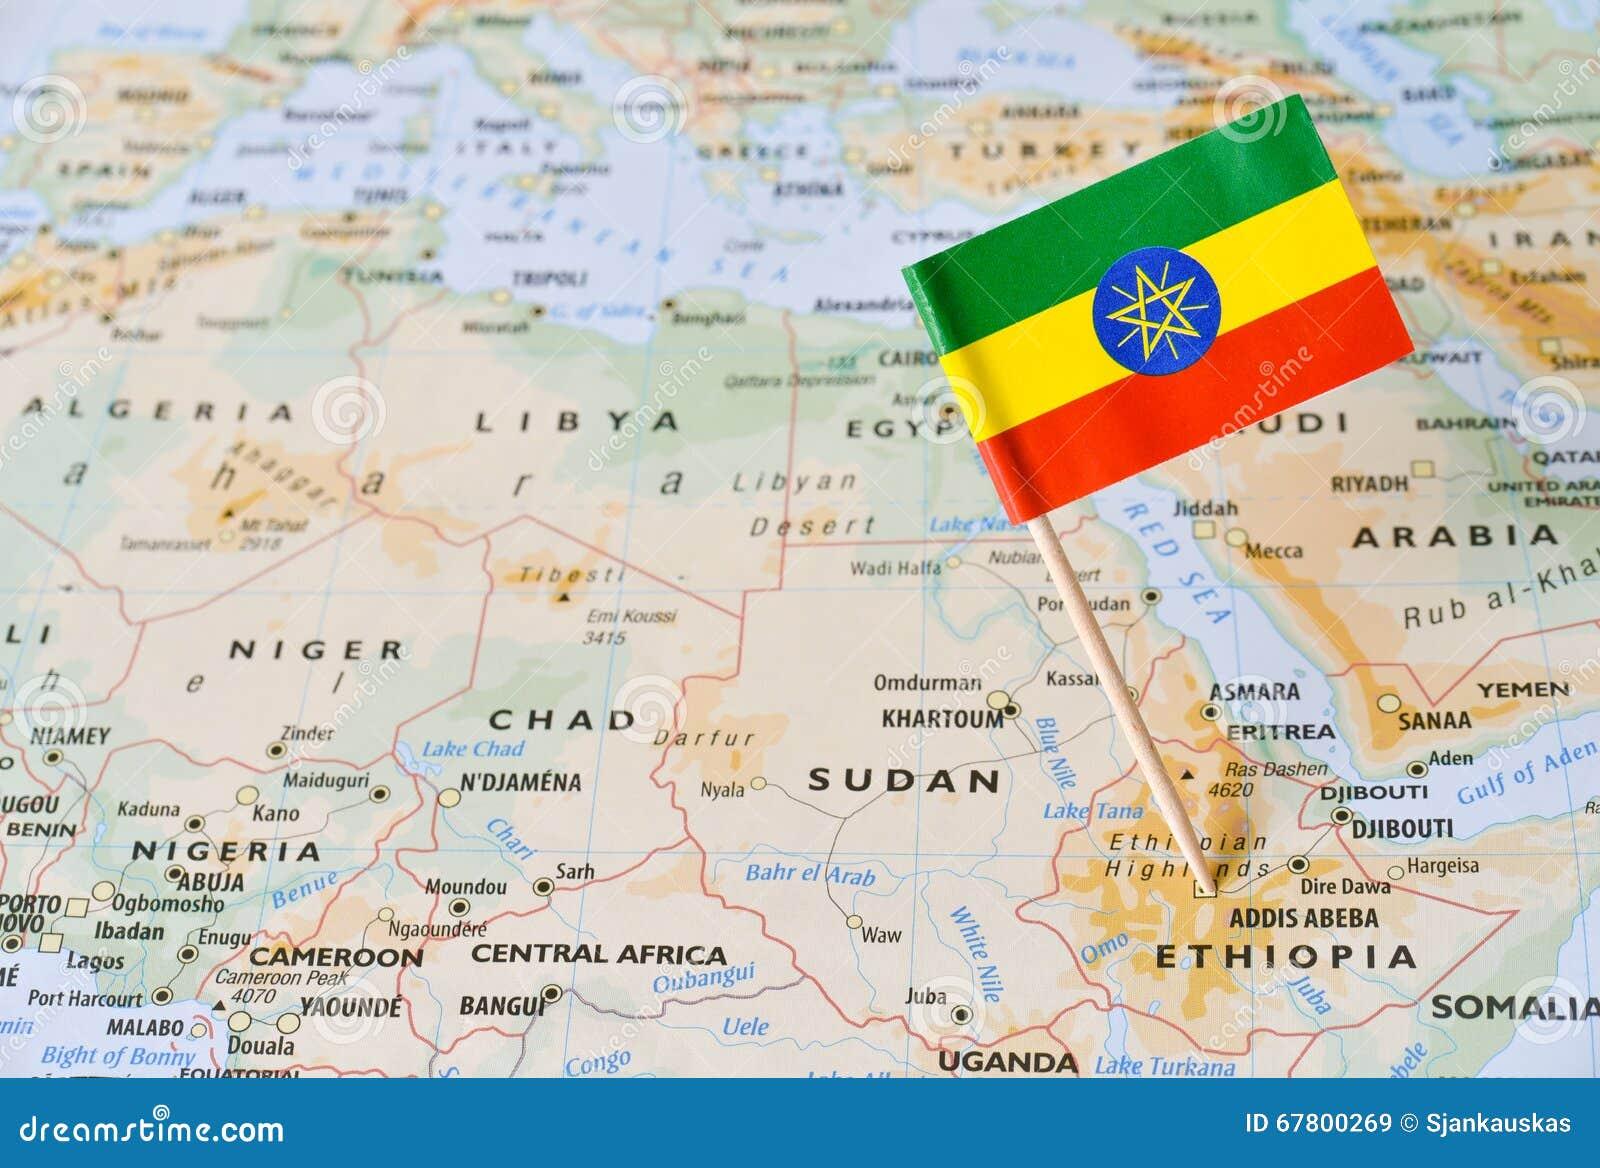 Ethiopia Map Stock Photos Download Images - Ethiopia map